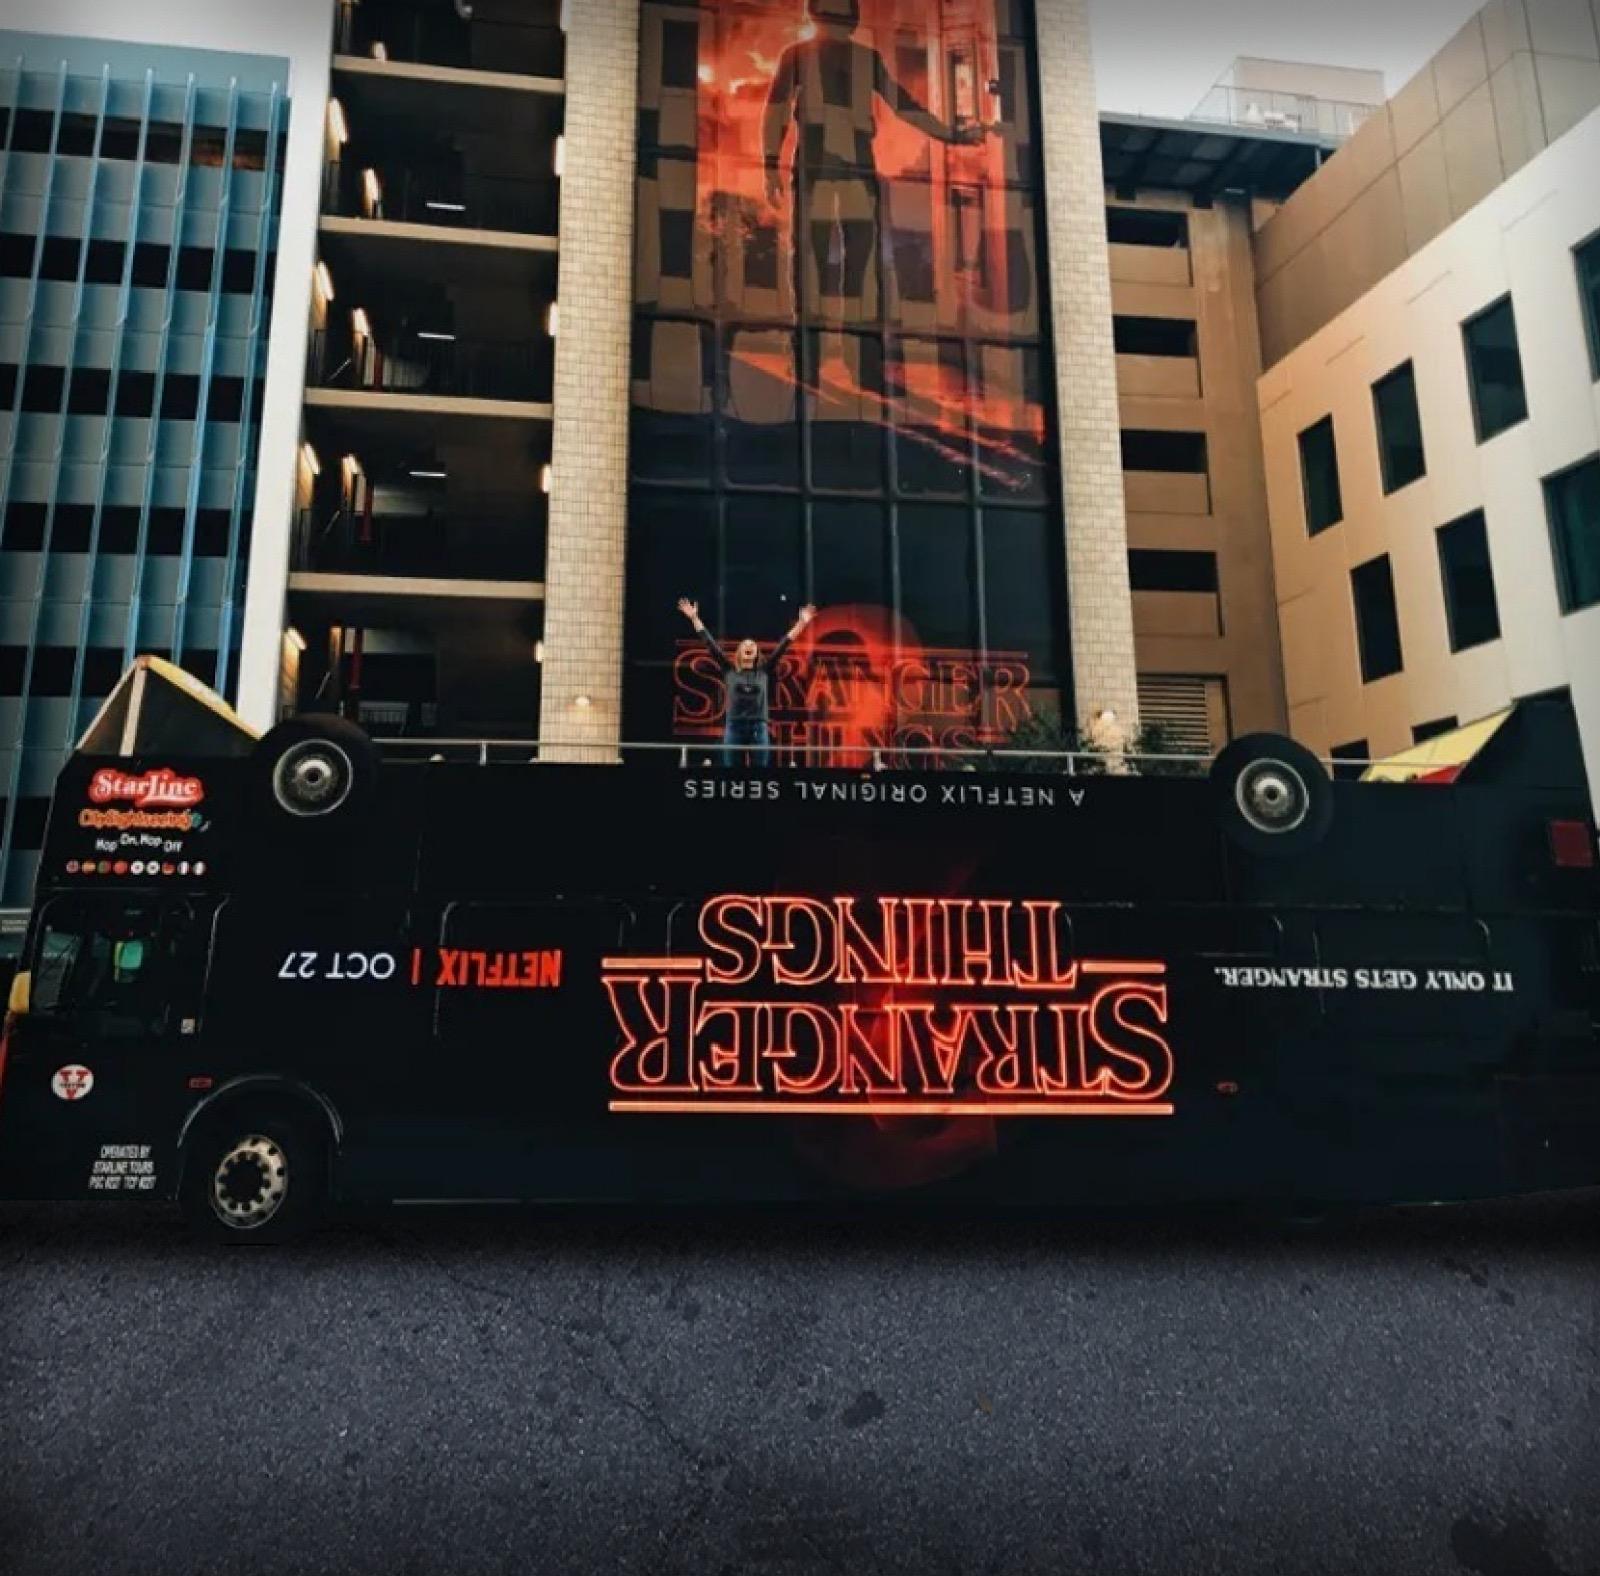 Netflix Stranger Things Season 2 bus in Los Angeles